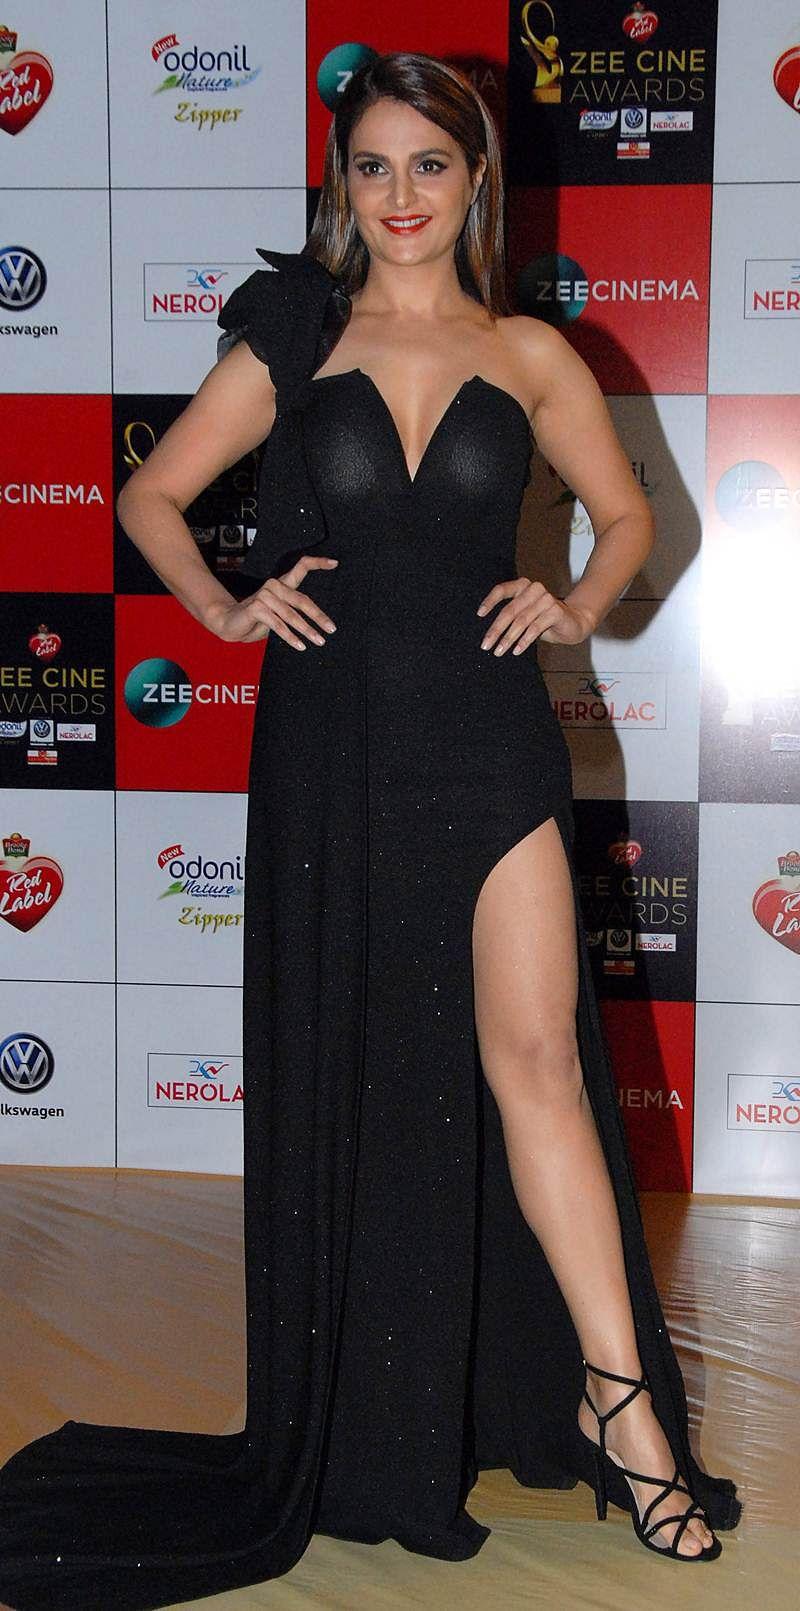 Monika Bedi attends the 'Zee Cine Awards 2018' ceremony in Mumbai on December 19, 2017. / AFP PHOTO / Sujit Jaiswal